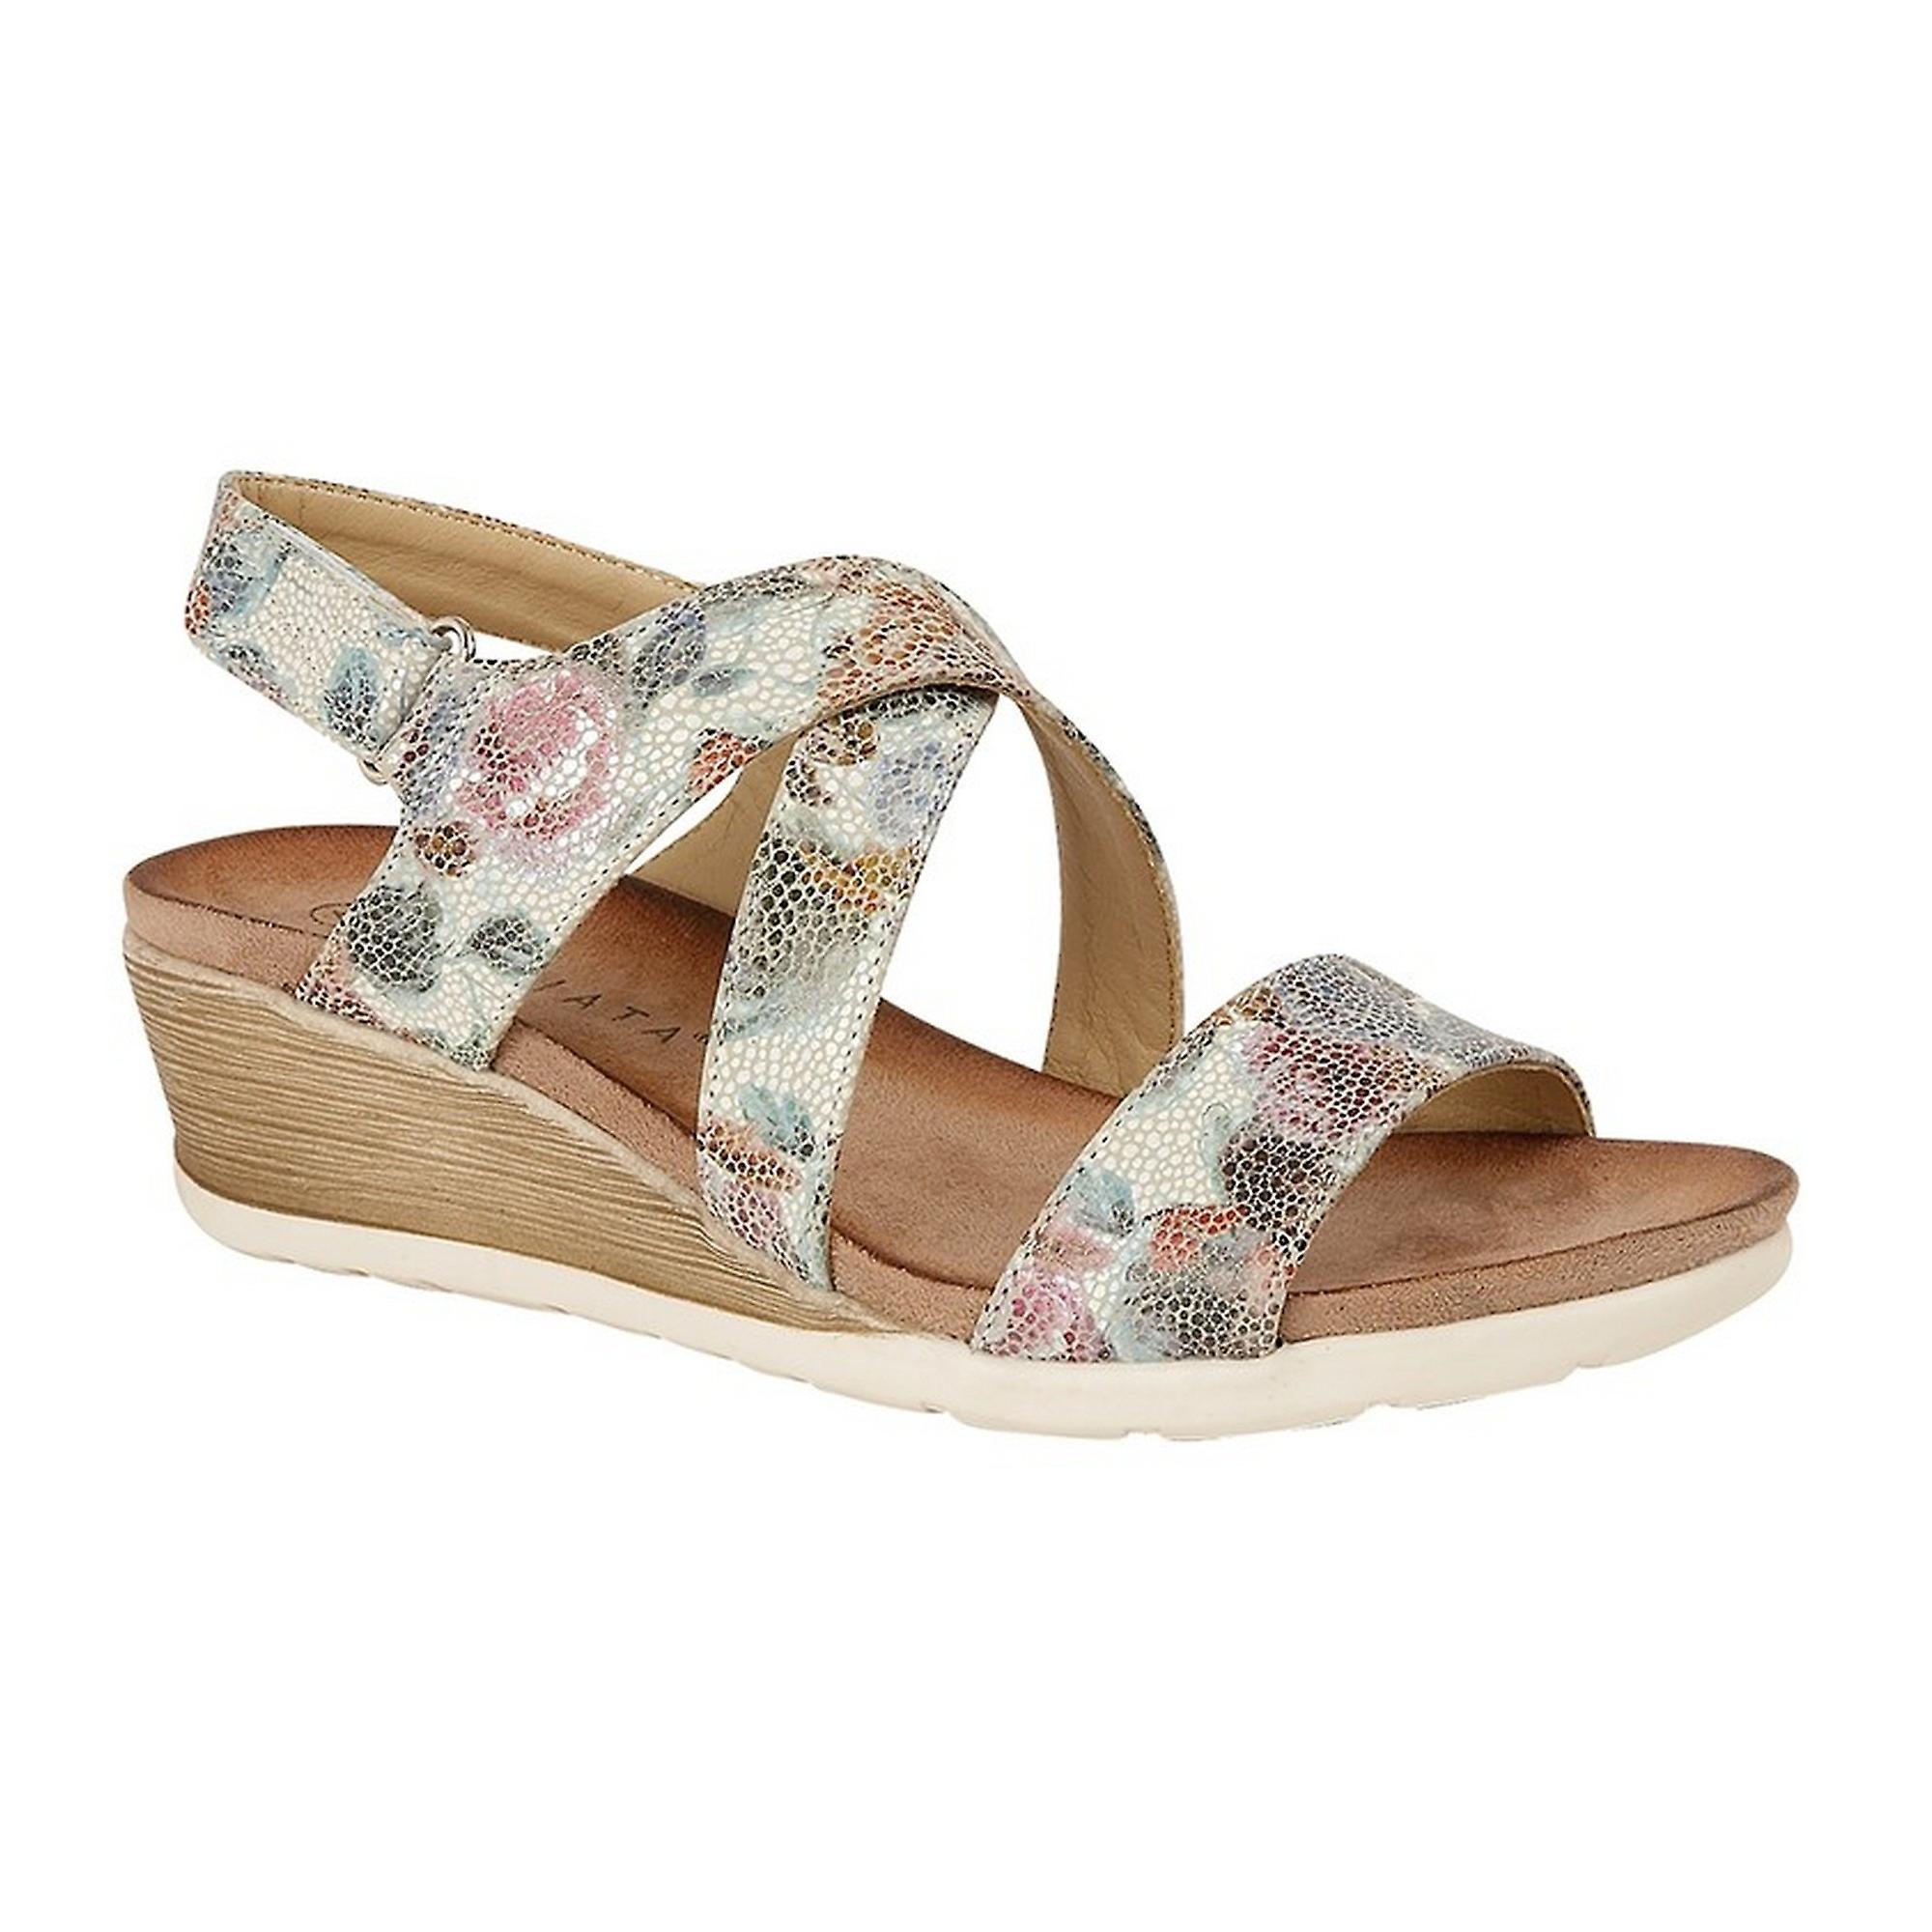 Cipriata Womens/Ladies Adia Crossover Strap Wedge Sandals